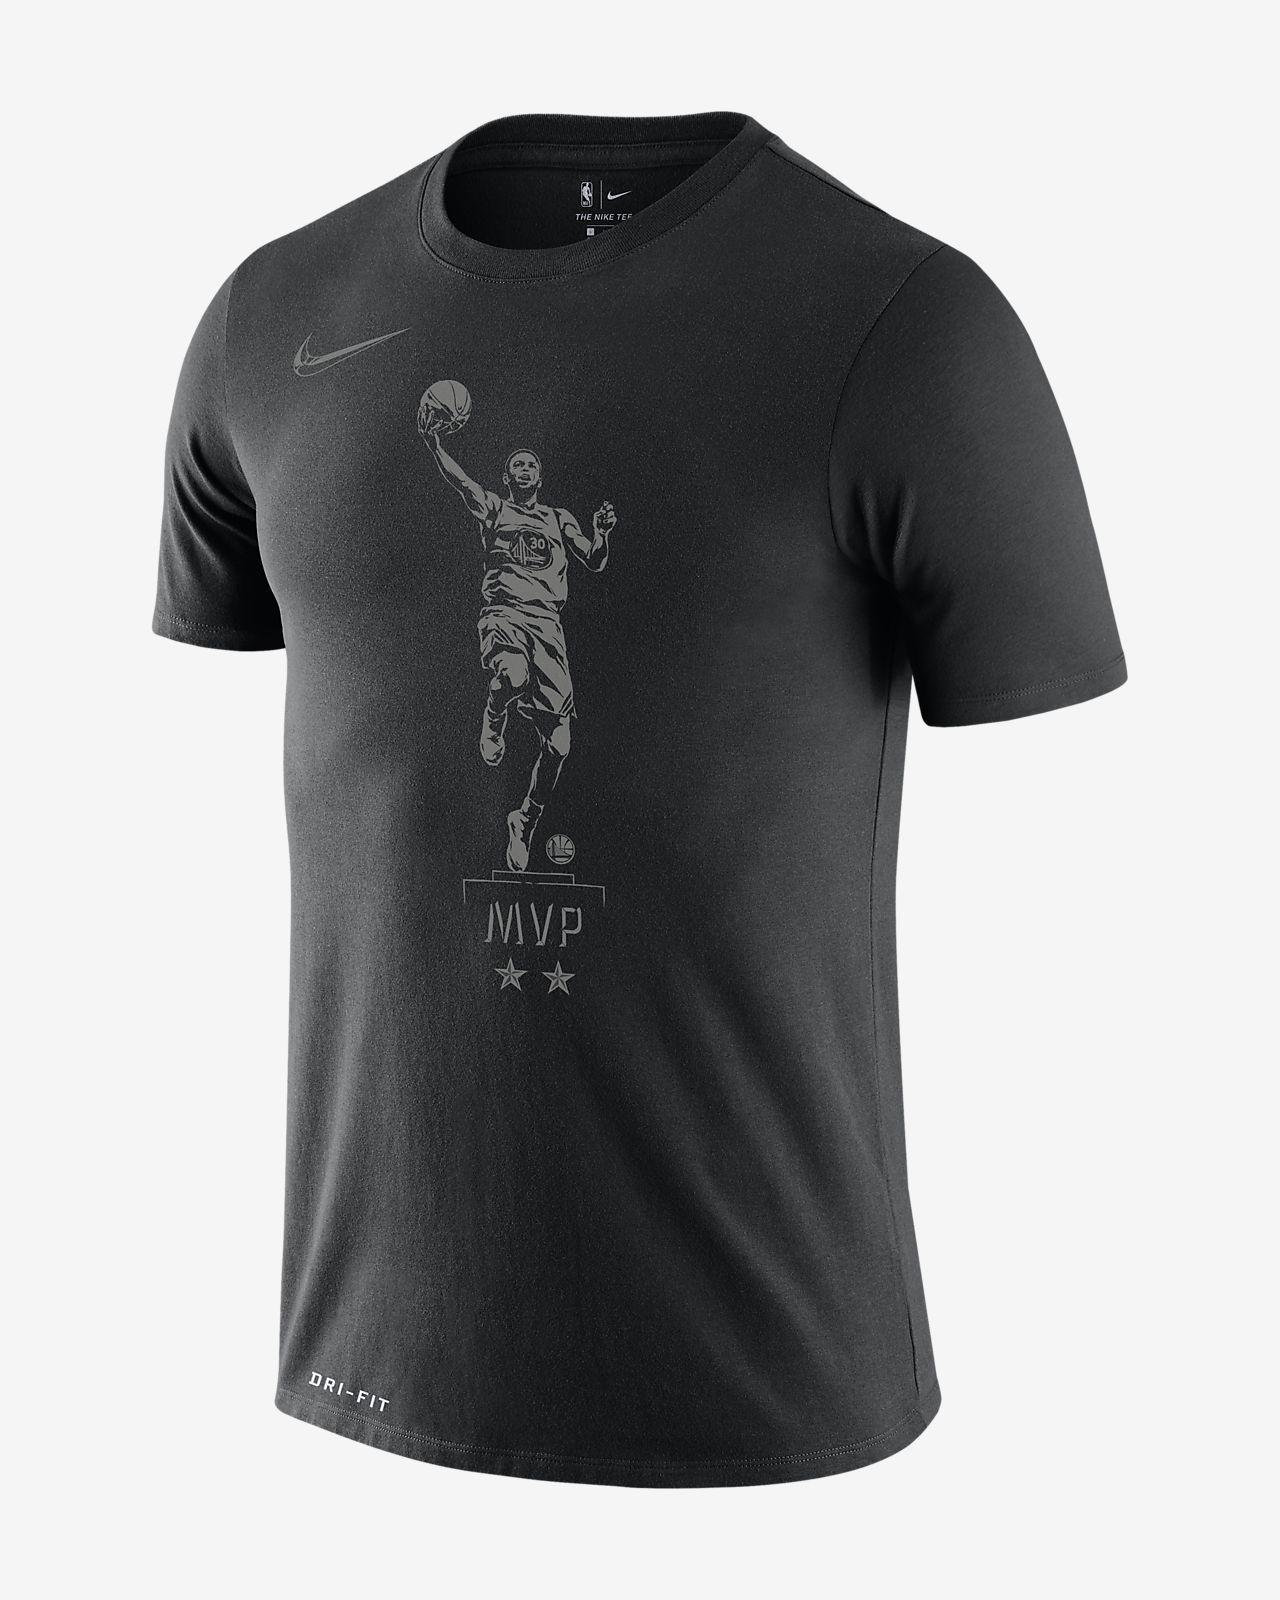 "(Stephen Curry) Nike Dri-FIT ""MVP"" 男子 NBA T恤"